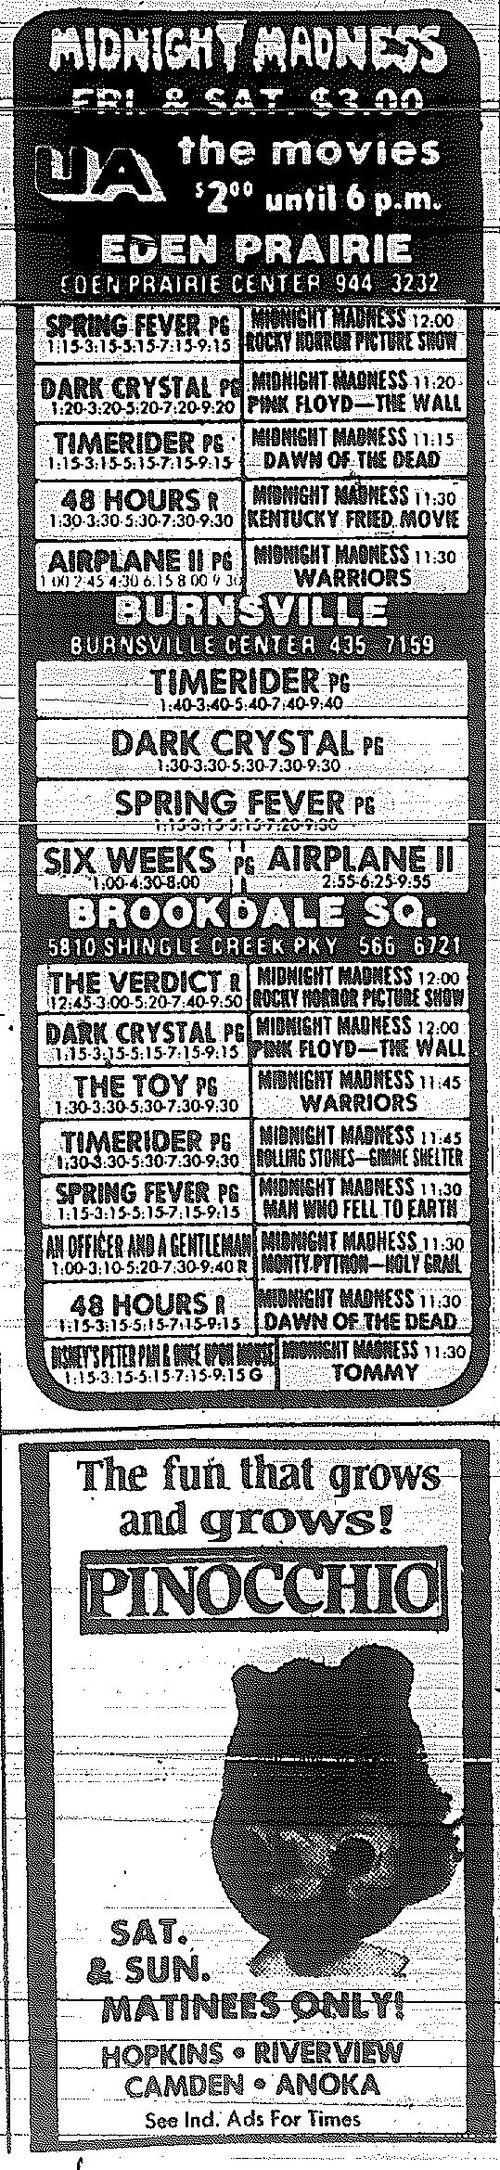 Minnesota Movie Ads 1983 14